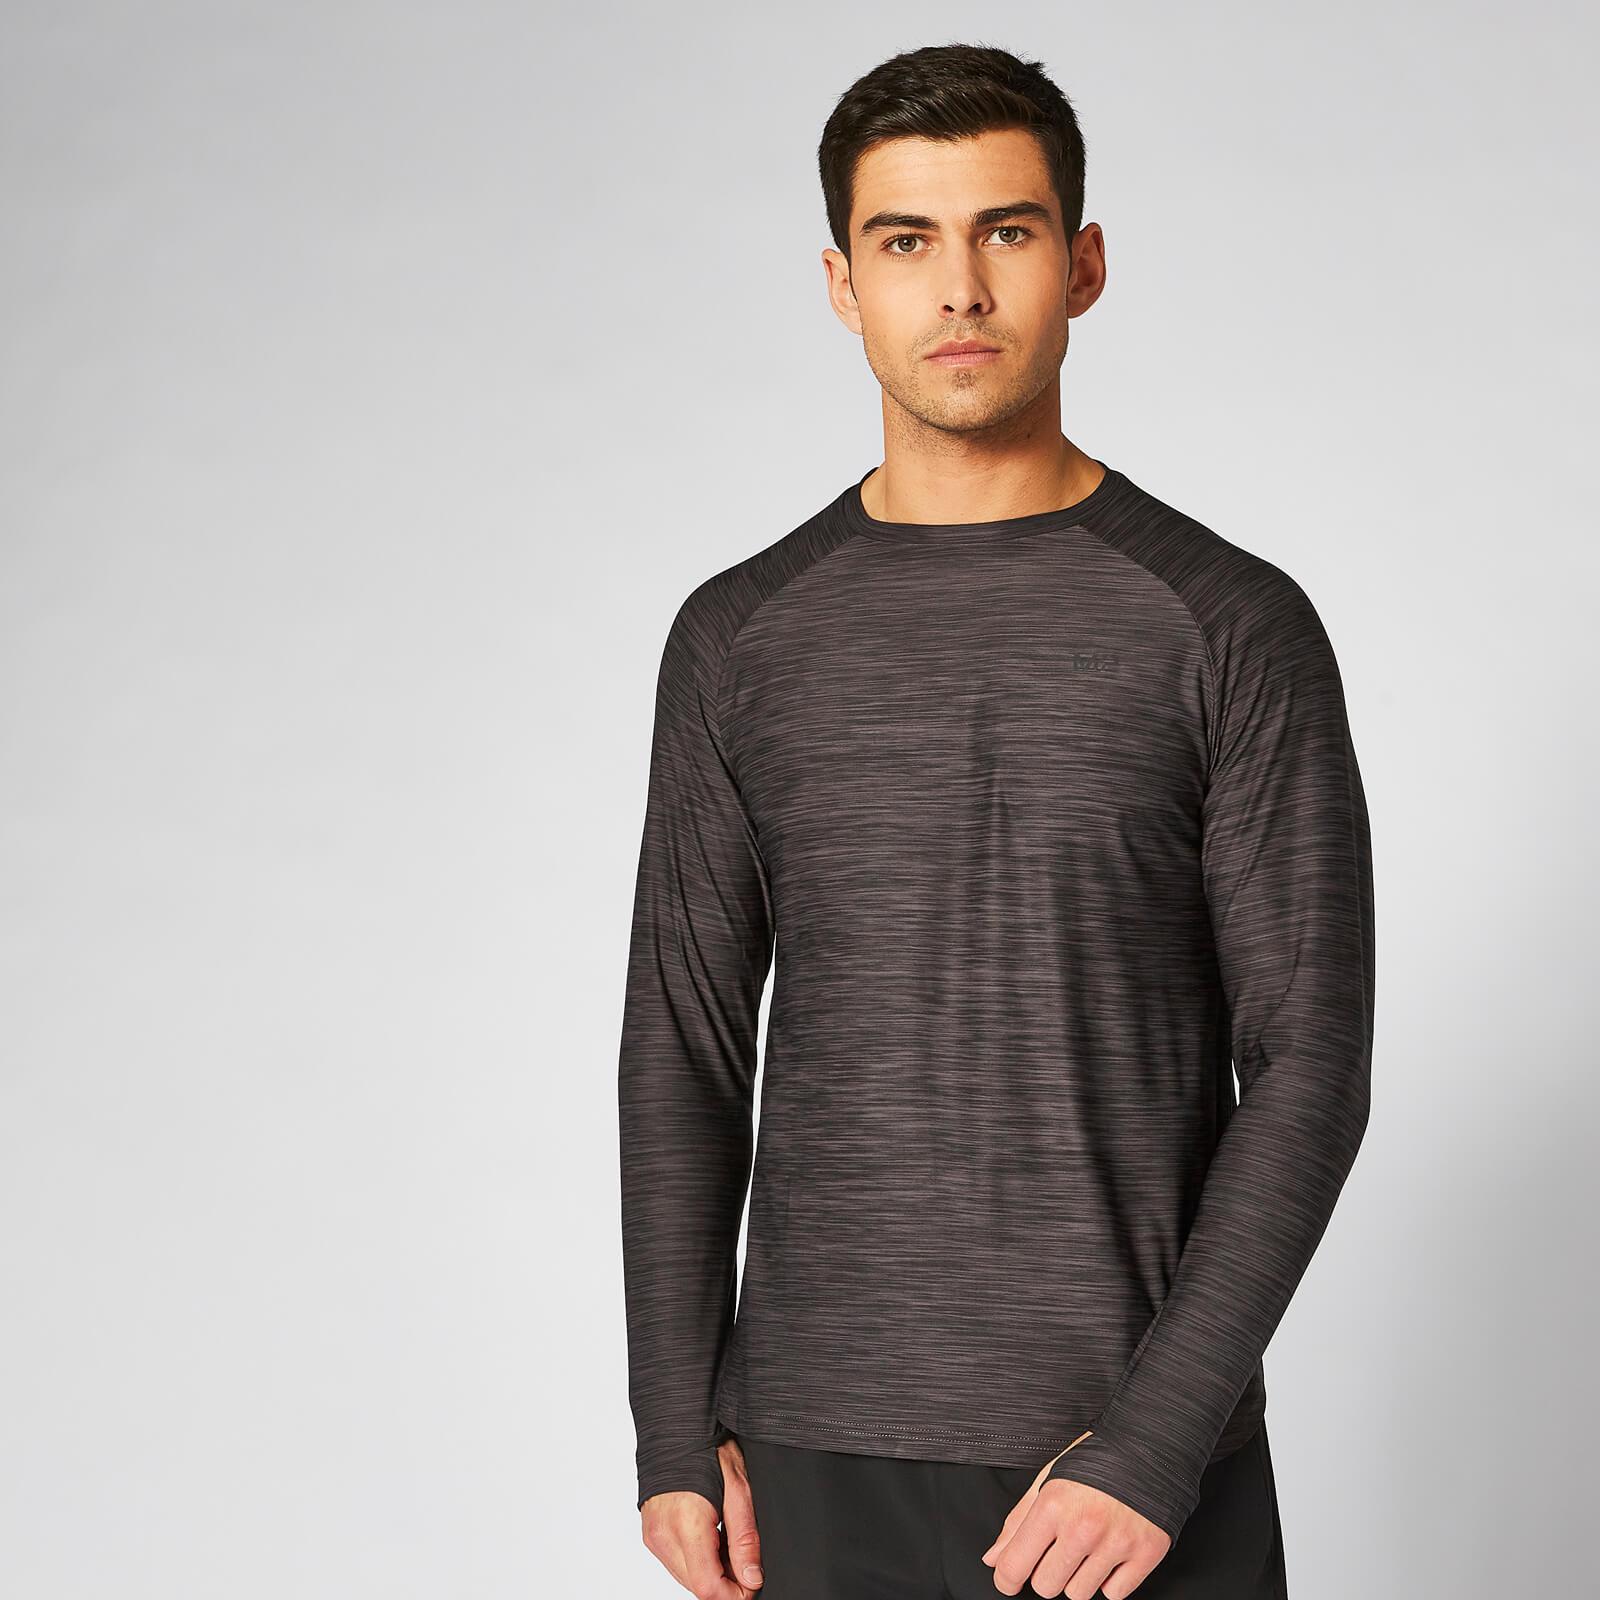 Myprotein Dry-Tech Infinity Long-Sleeve T-Shirt - Slate Marl - XS